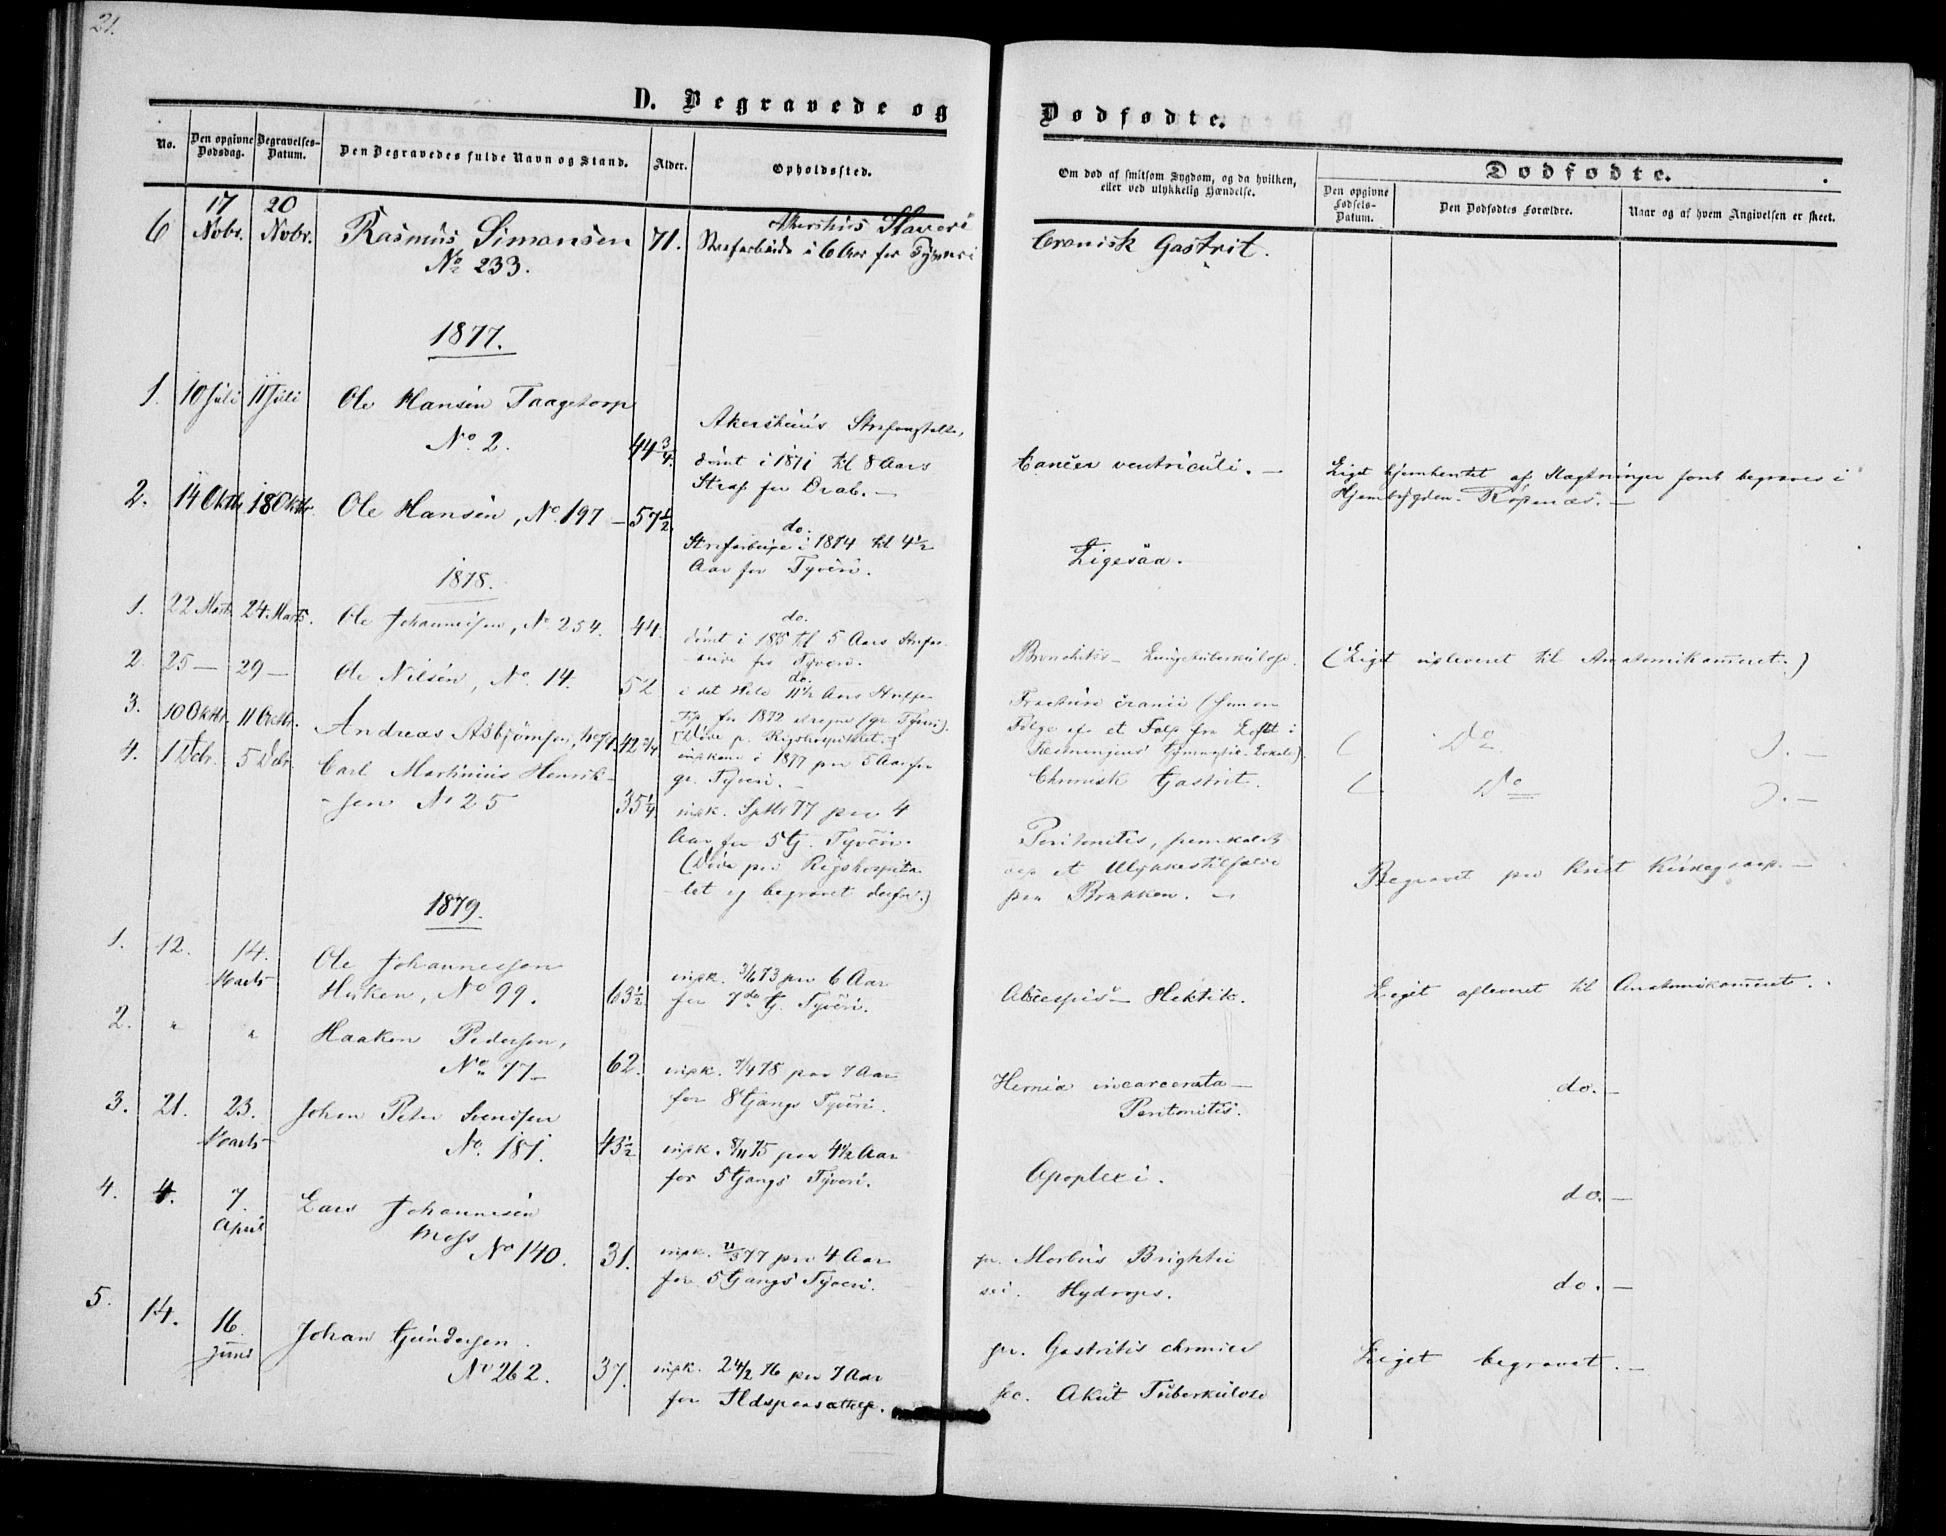 SAO, Akershus festnings slaveri Kirkebøker, F/Fa/L0002: Ministerialbok nr. 2, 1852-1883, s. 21